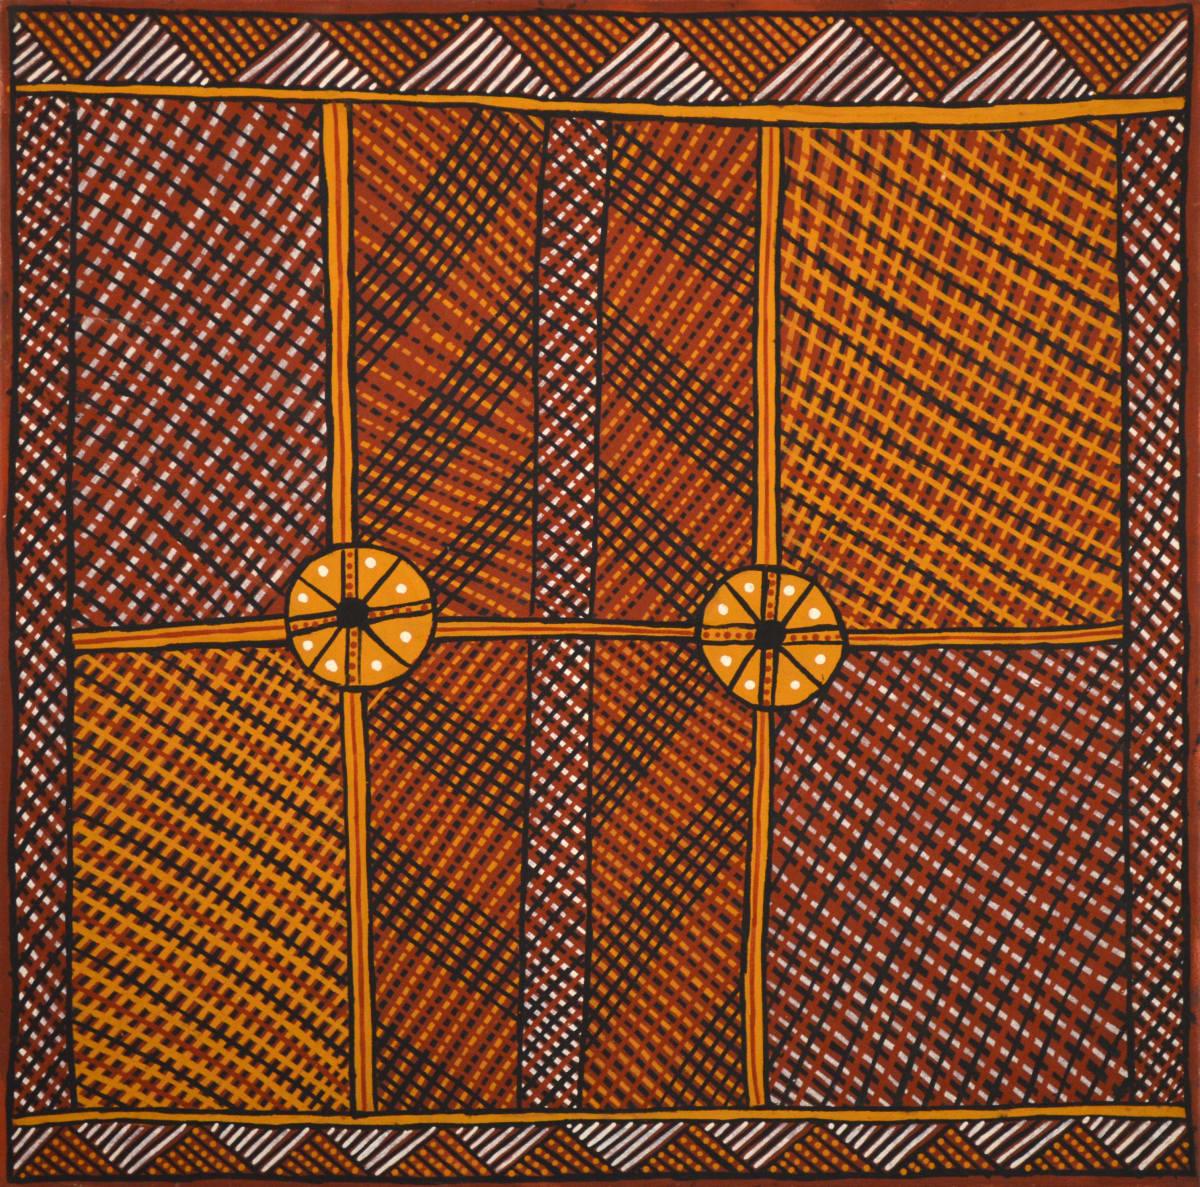 Raymond Bush Jilamara ochre on canvas 90 x 90 cm